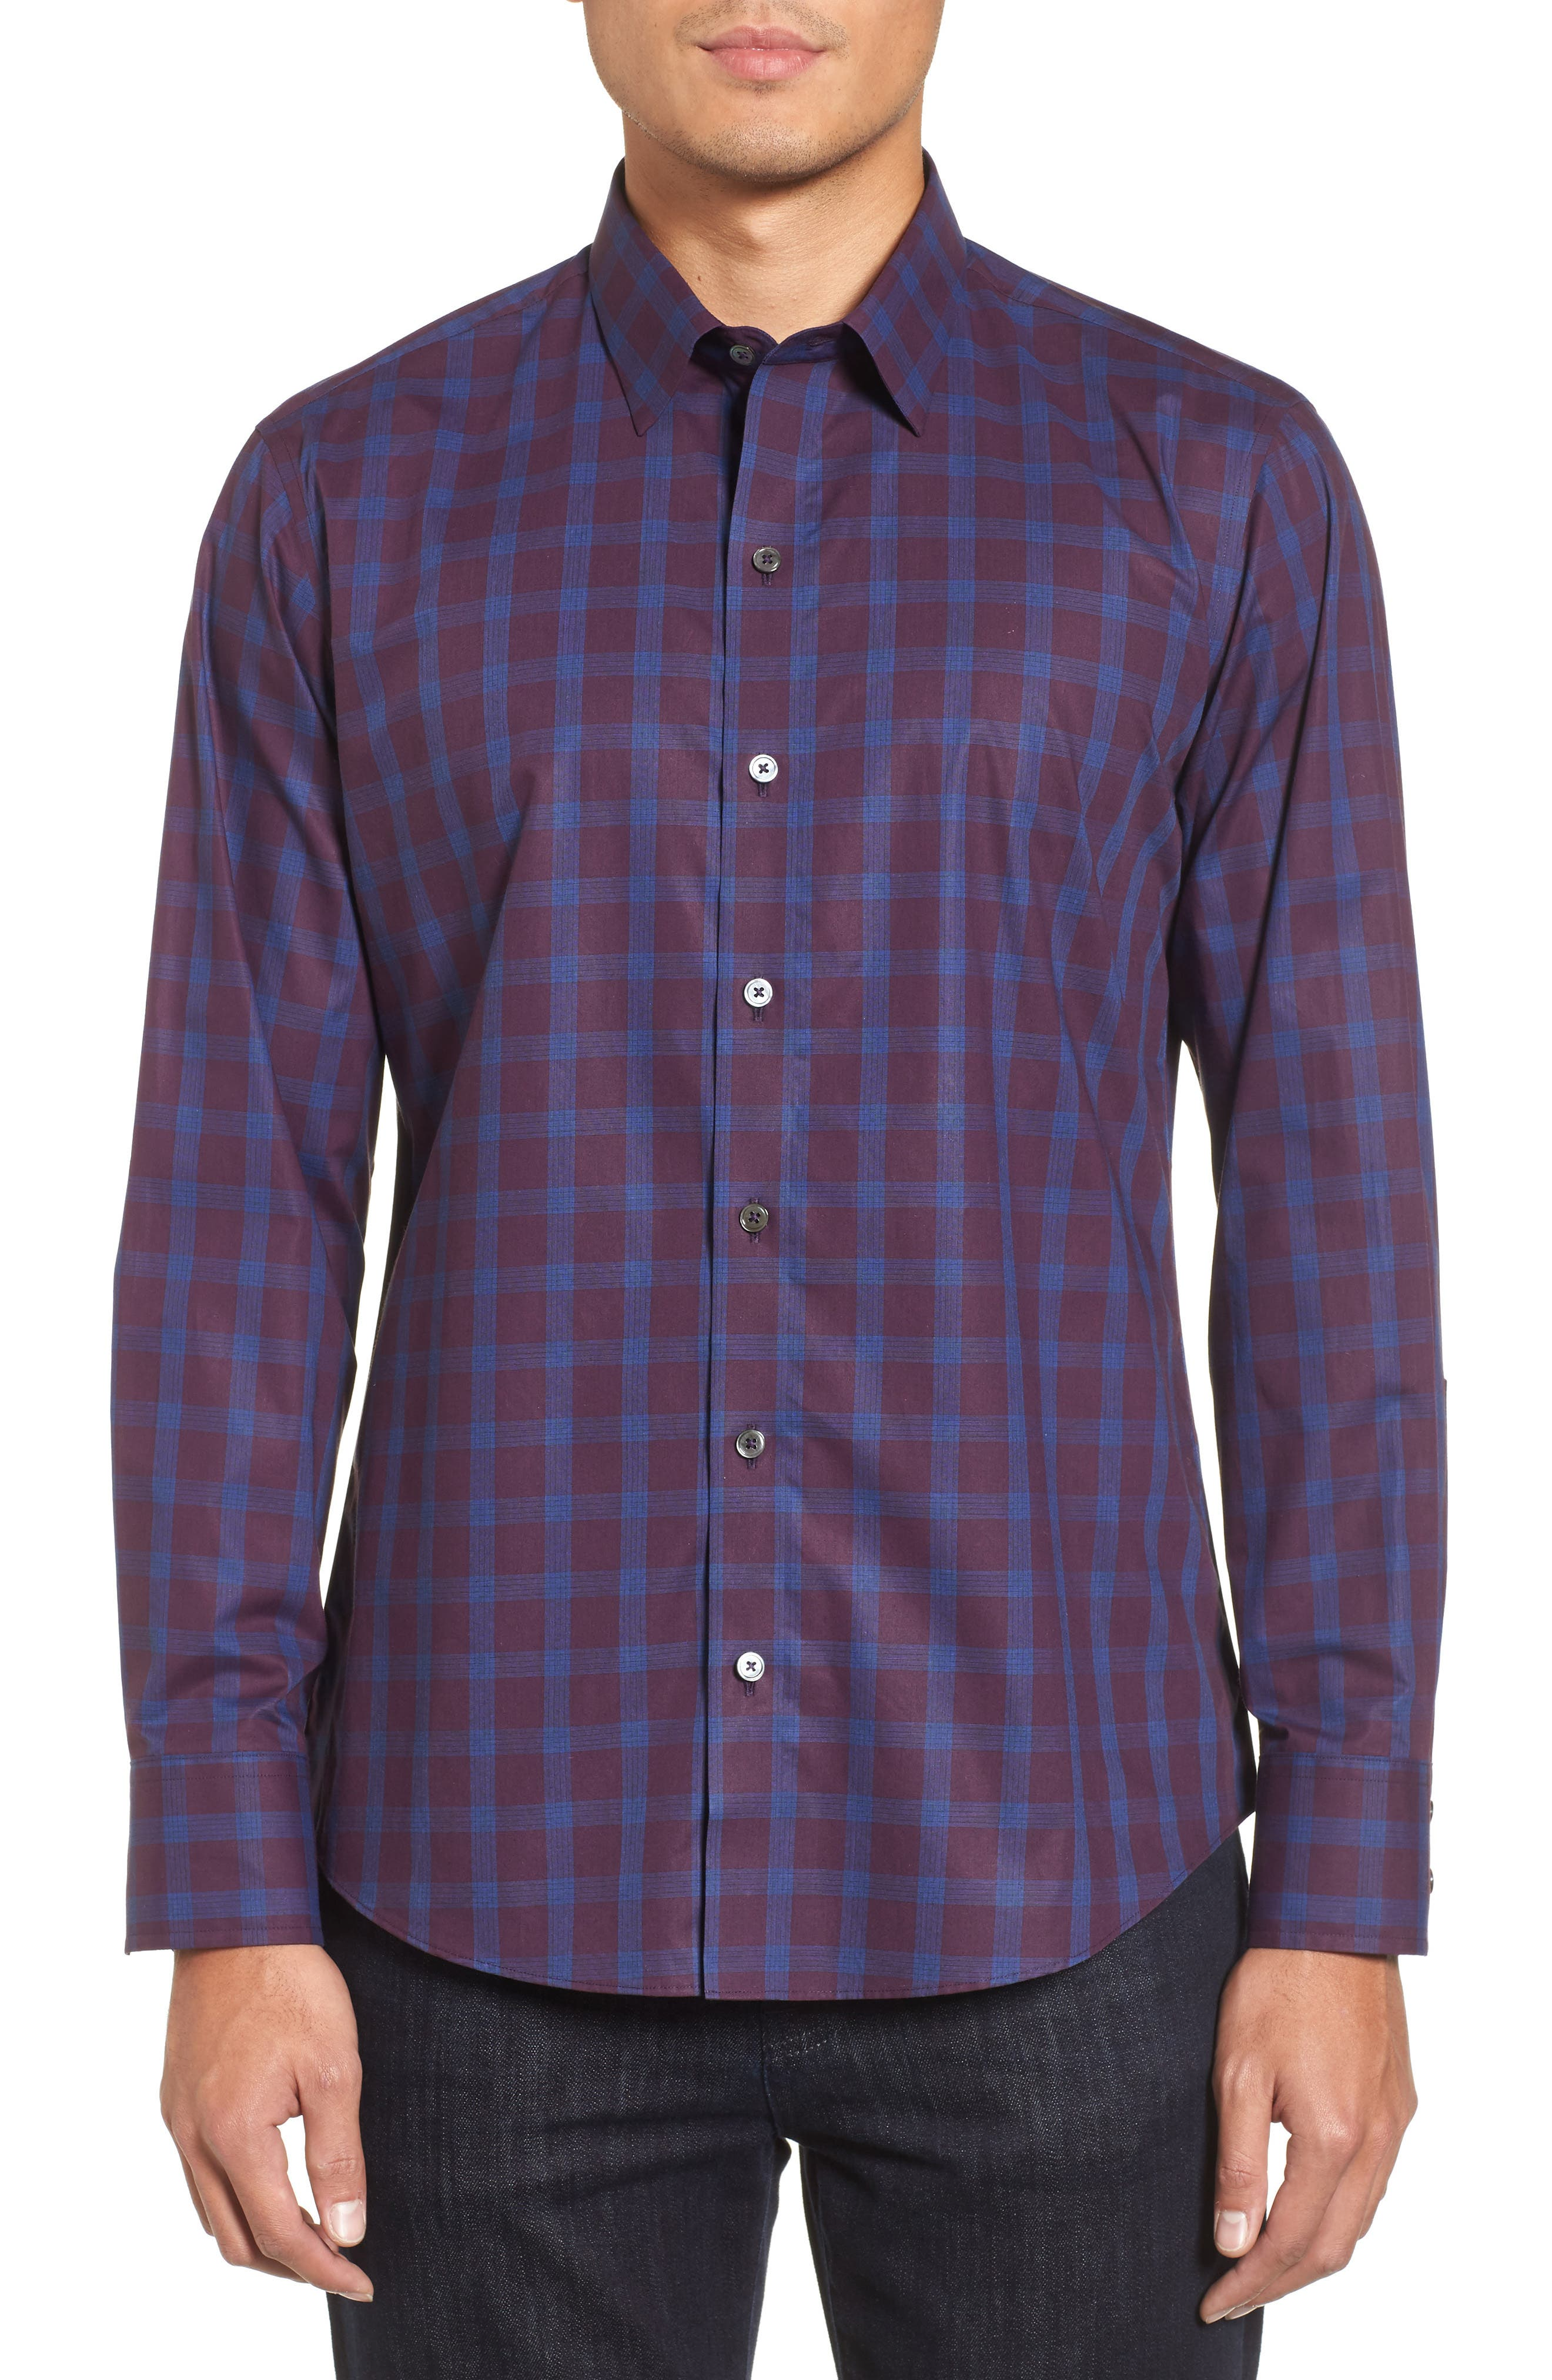 Raymond Check Sport Shirt,                         Main,                         color, 930